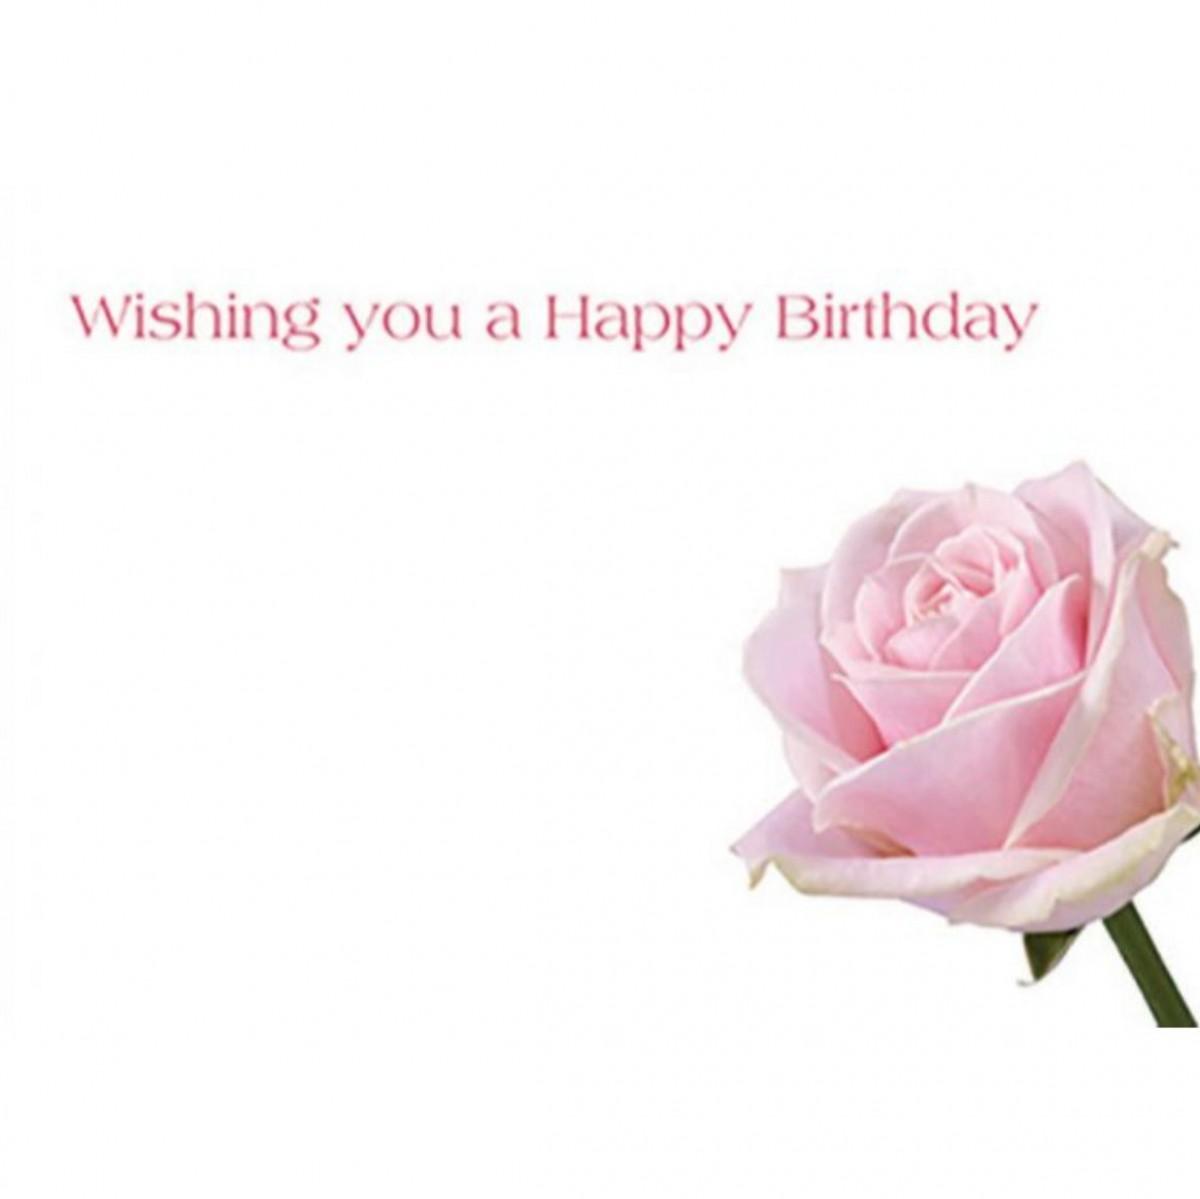 4508 Wishing Happy Birthday Day Rose Pink 9x6cm 50x1 Cards